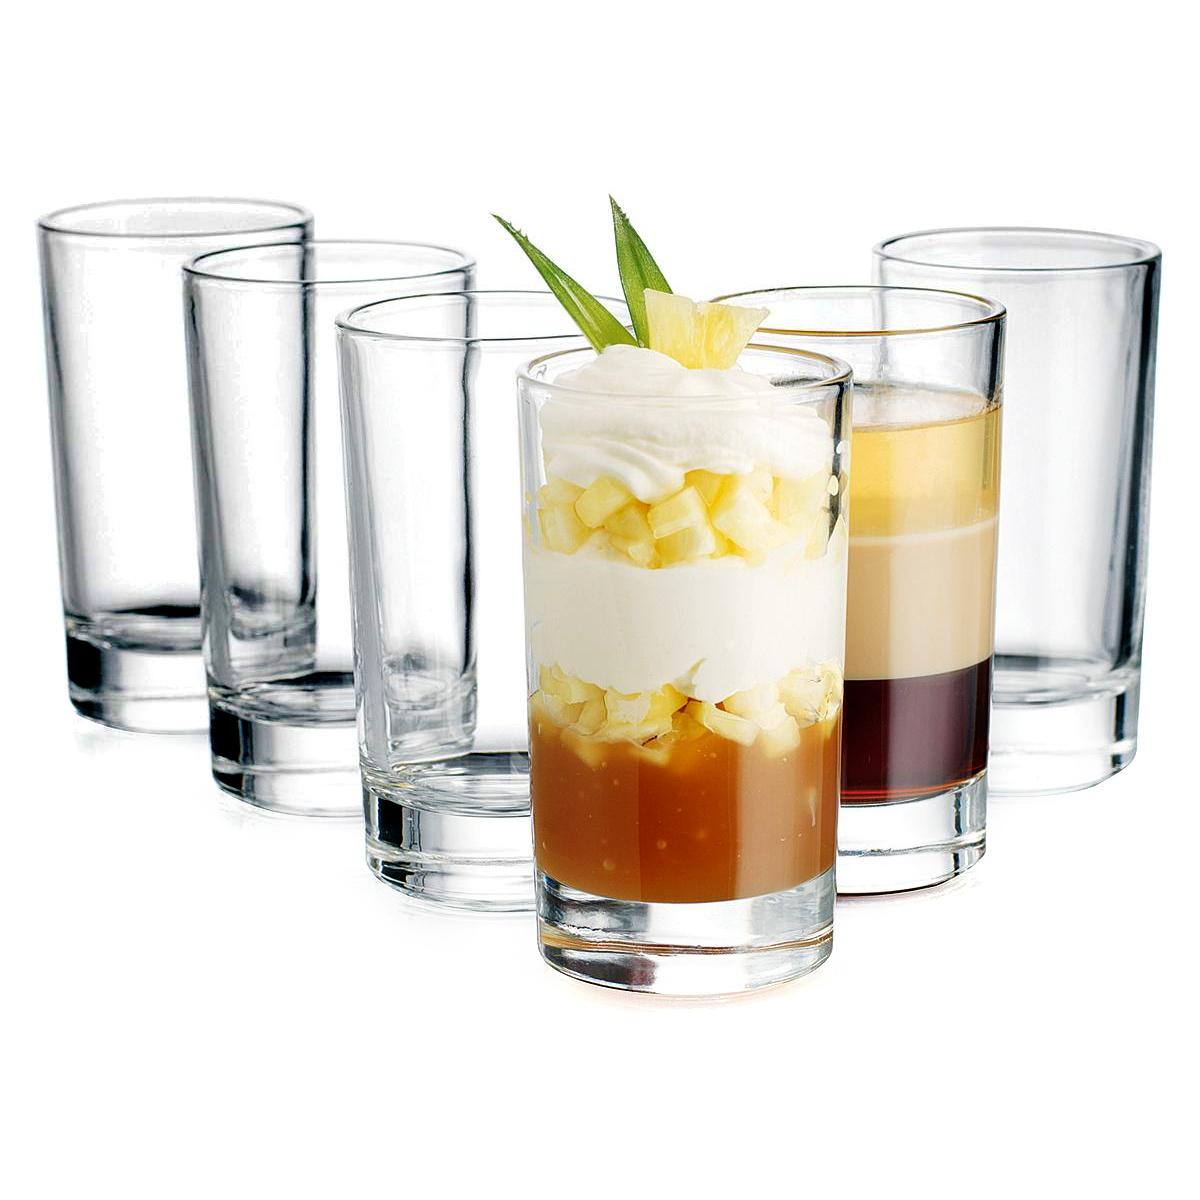 Home Essentials Delight 5.4 Ounce Dessert Glass, Set of 6